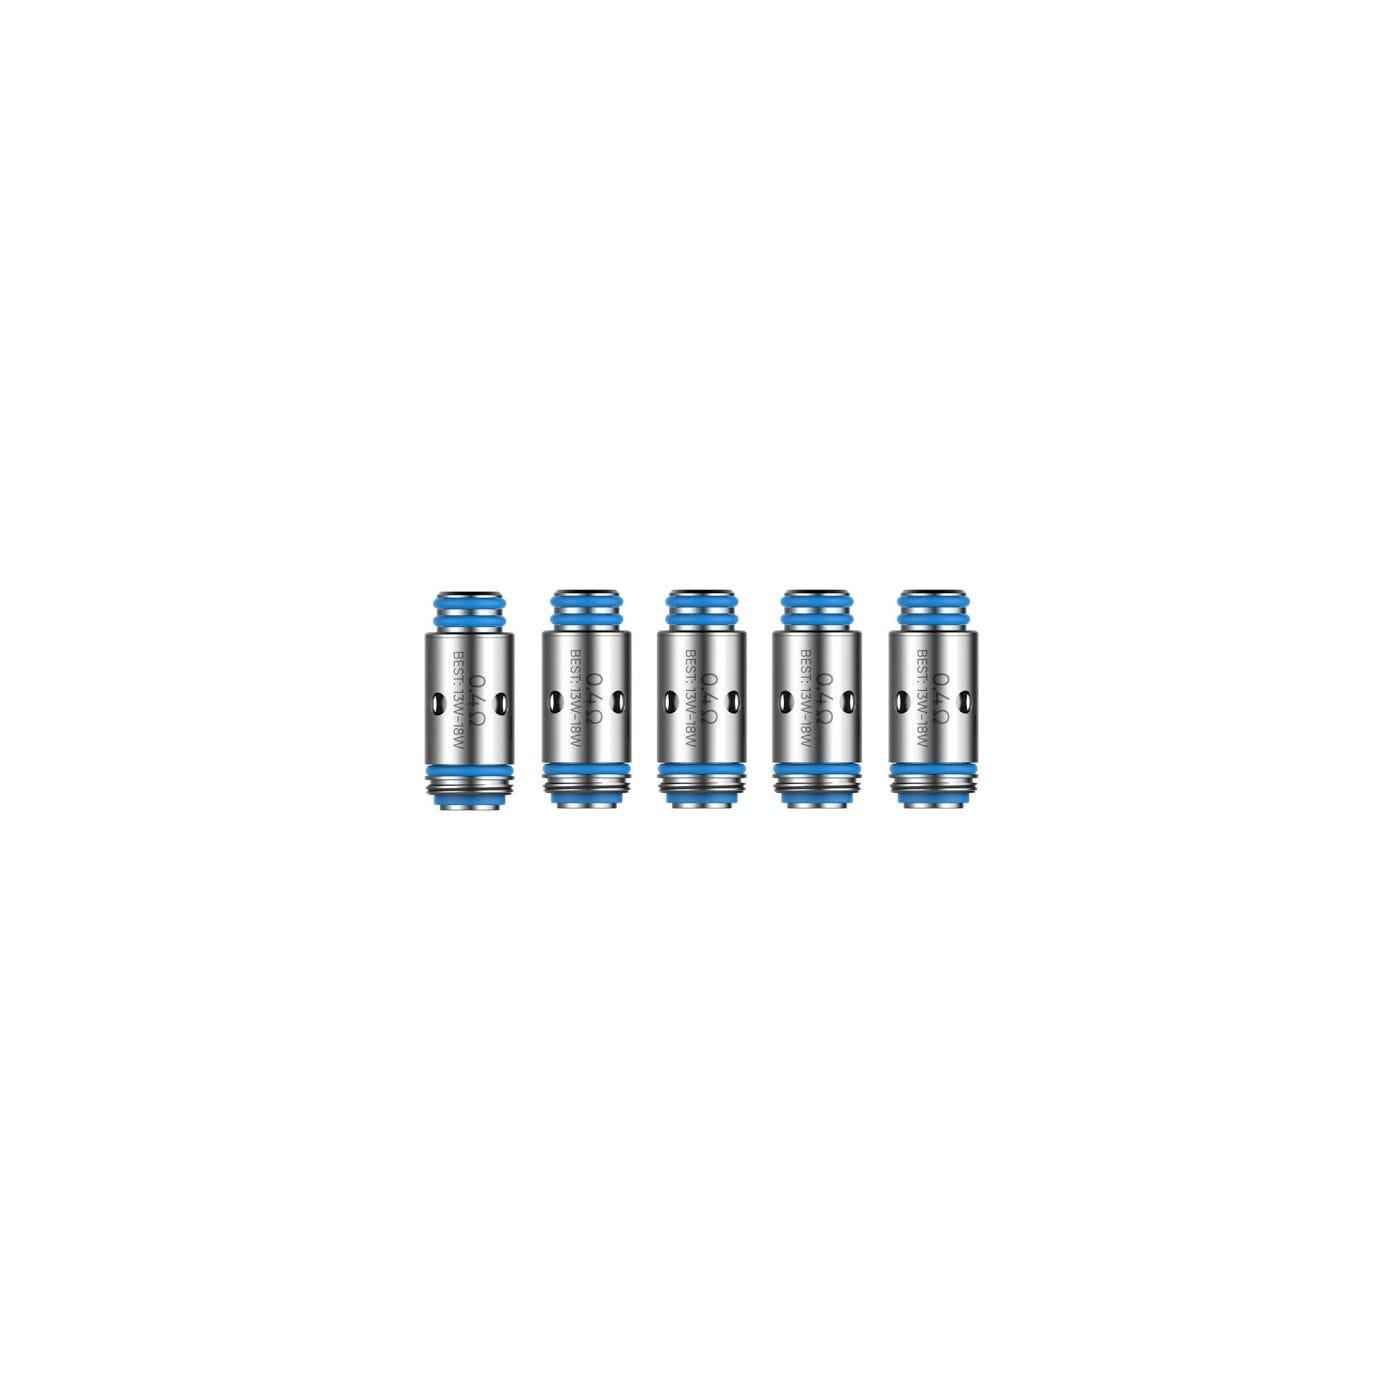 Smok OFRF NexMesh DC MTL Coil - 0.4 ohm - 5 Pack